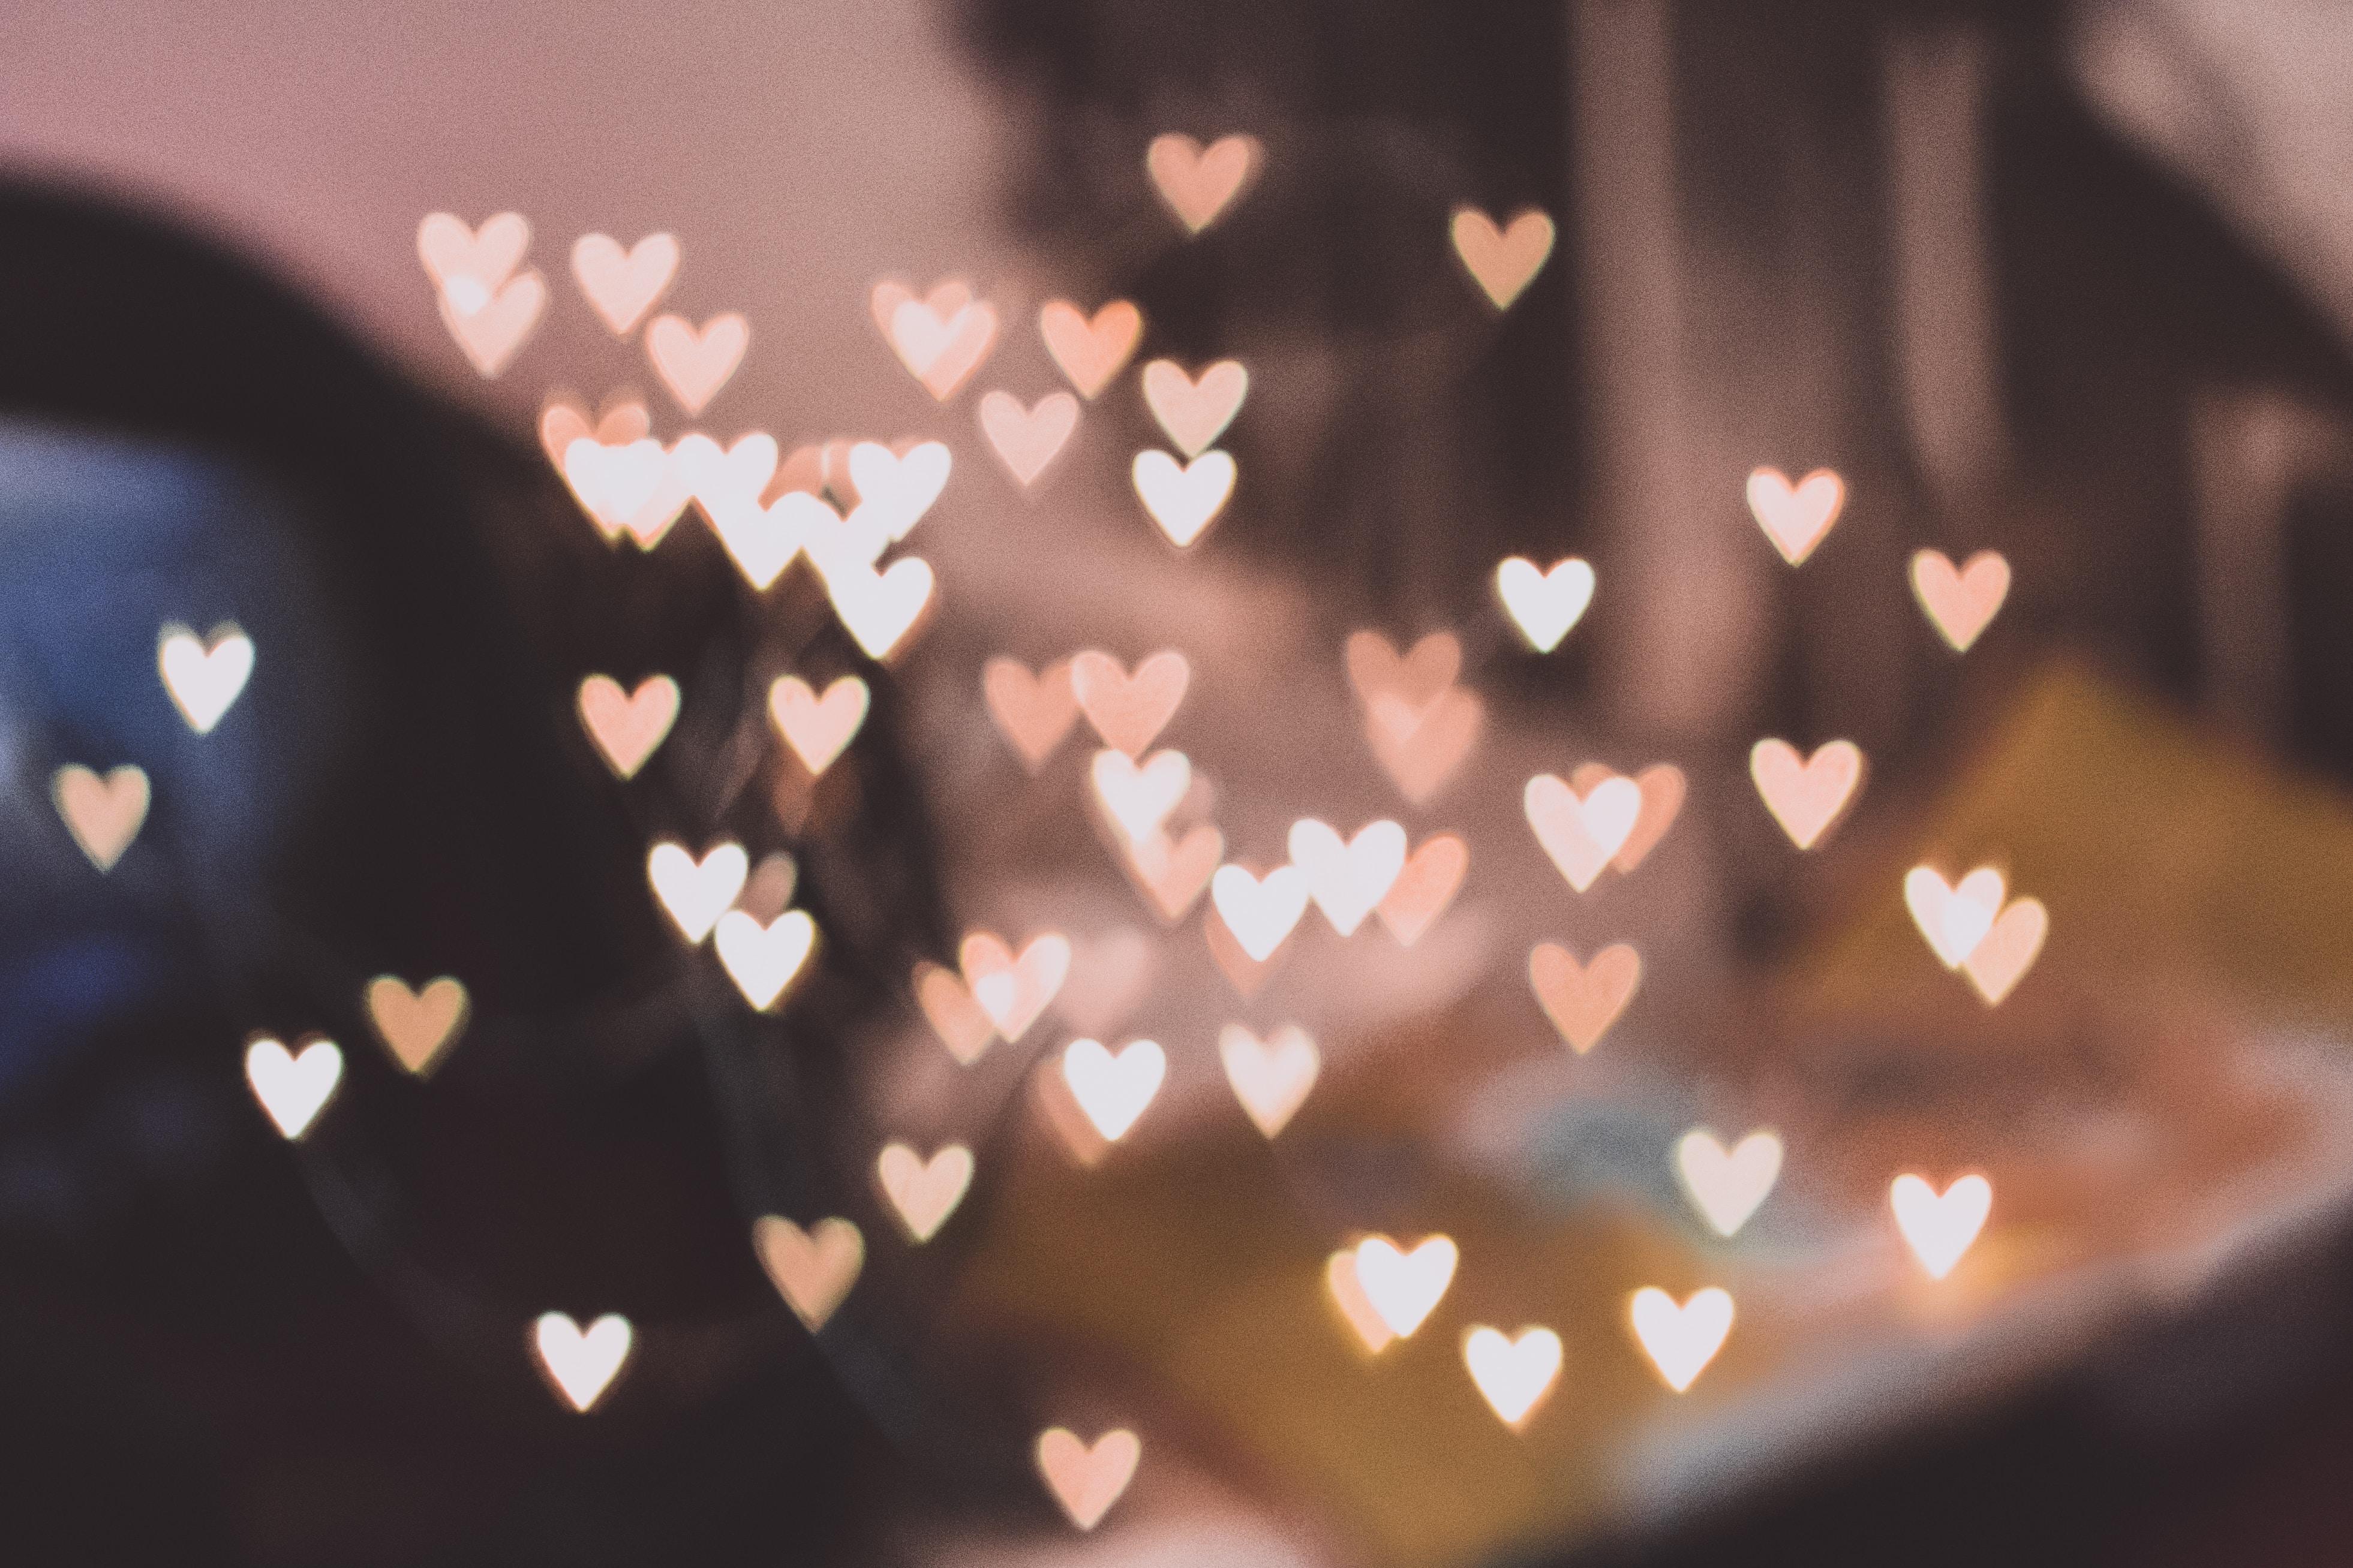 Hjerter, hearts, lyserød, pink. (Foto: Unsplash)